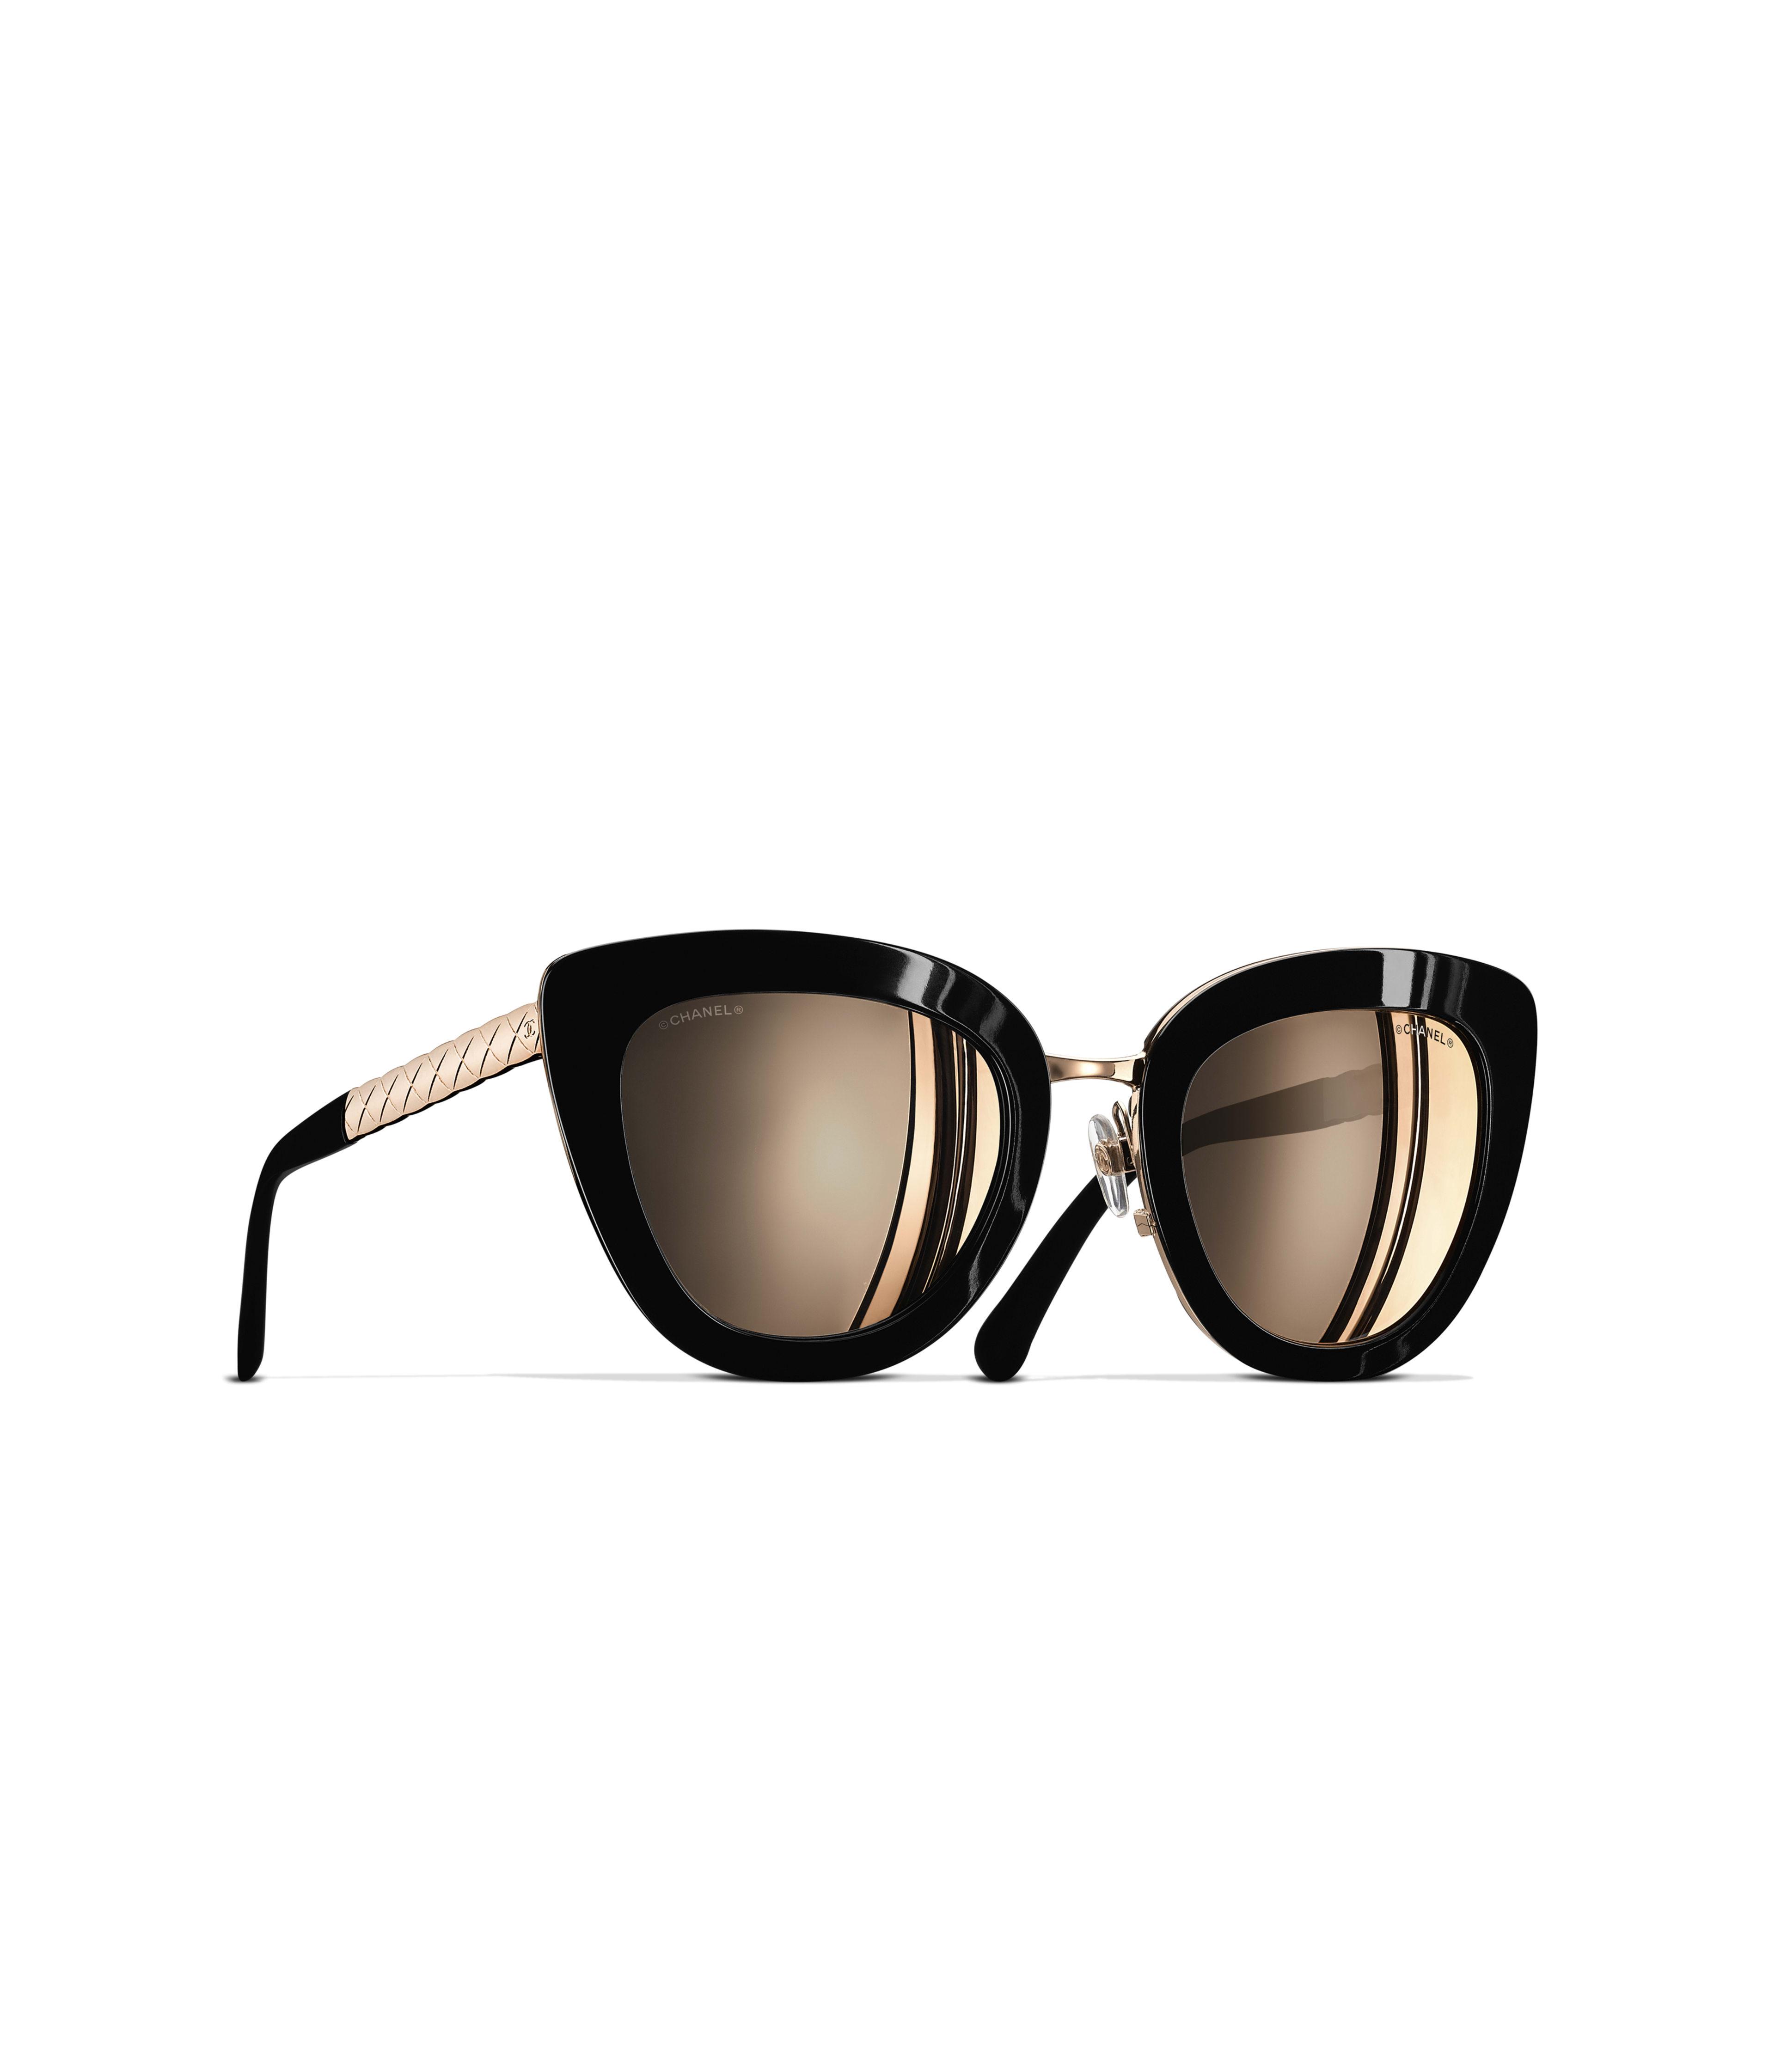 909ac69fbb Cat Eye Sunglasses Black eyewear